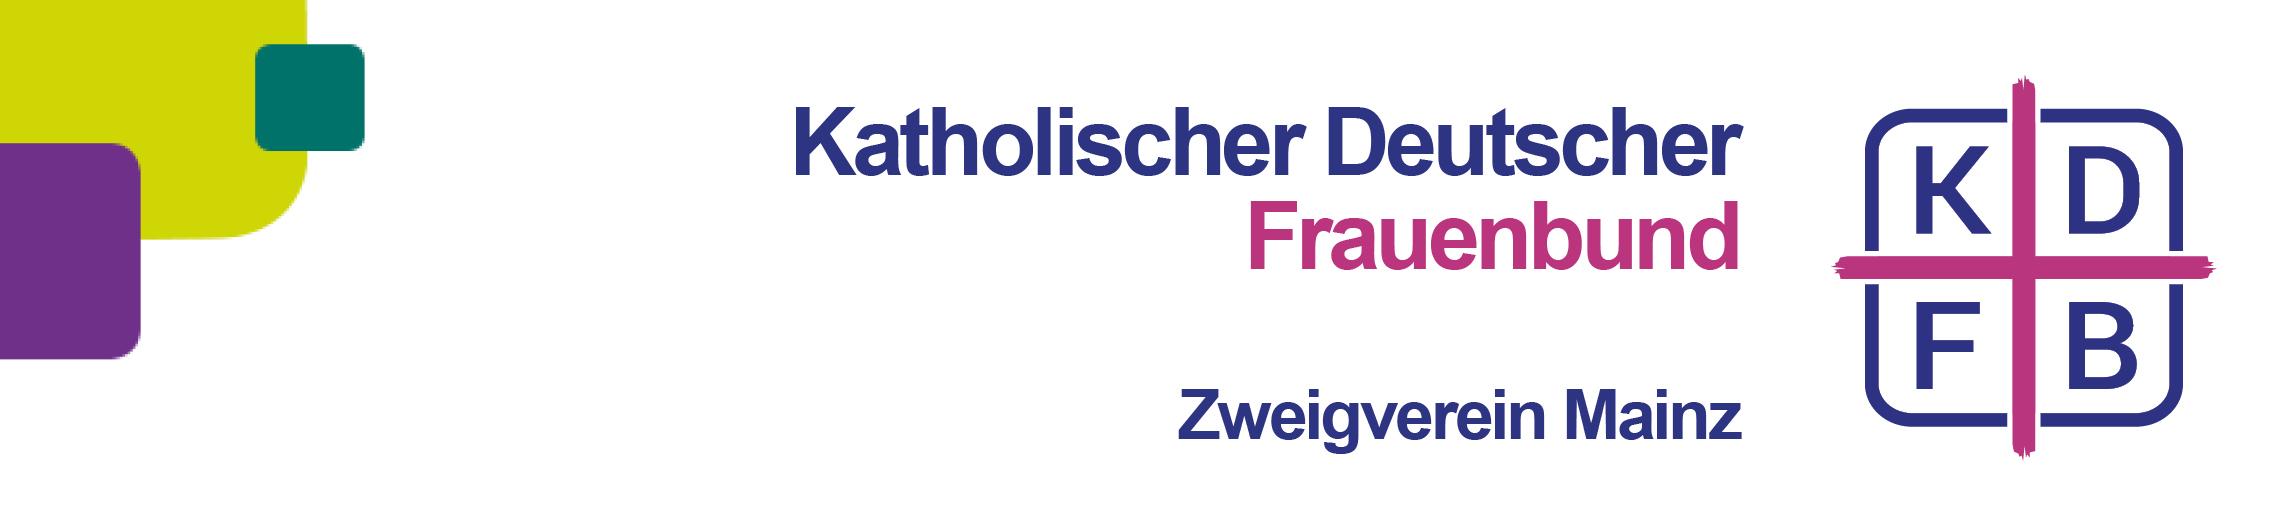 KDFB ZV Mainz